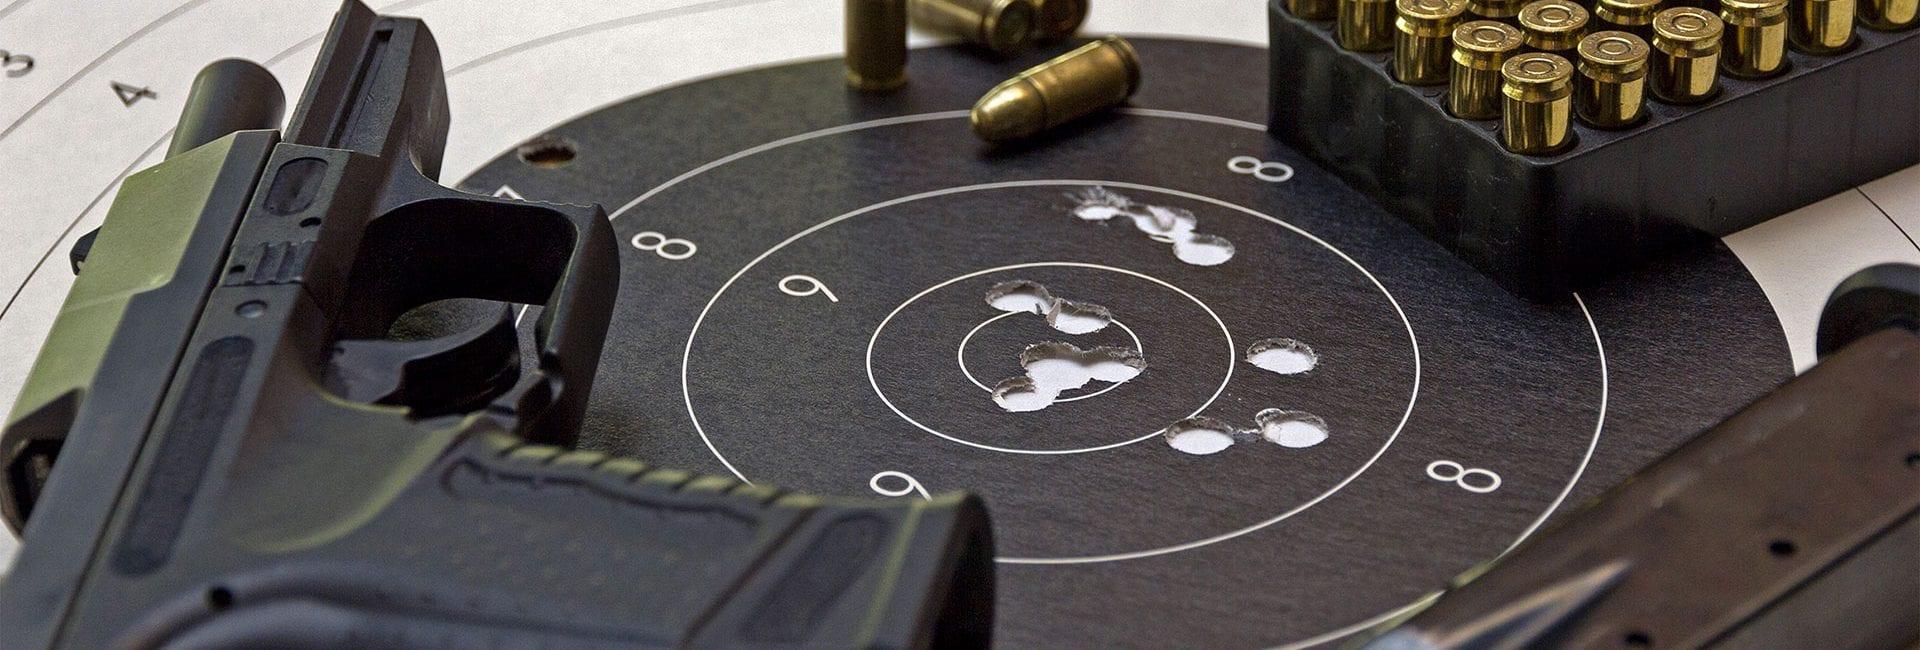 pistol_mag_target